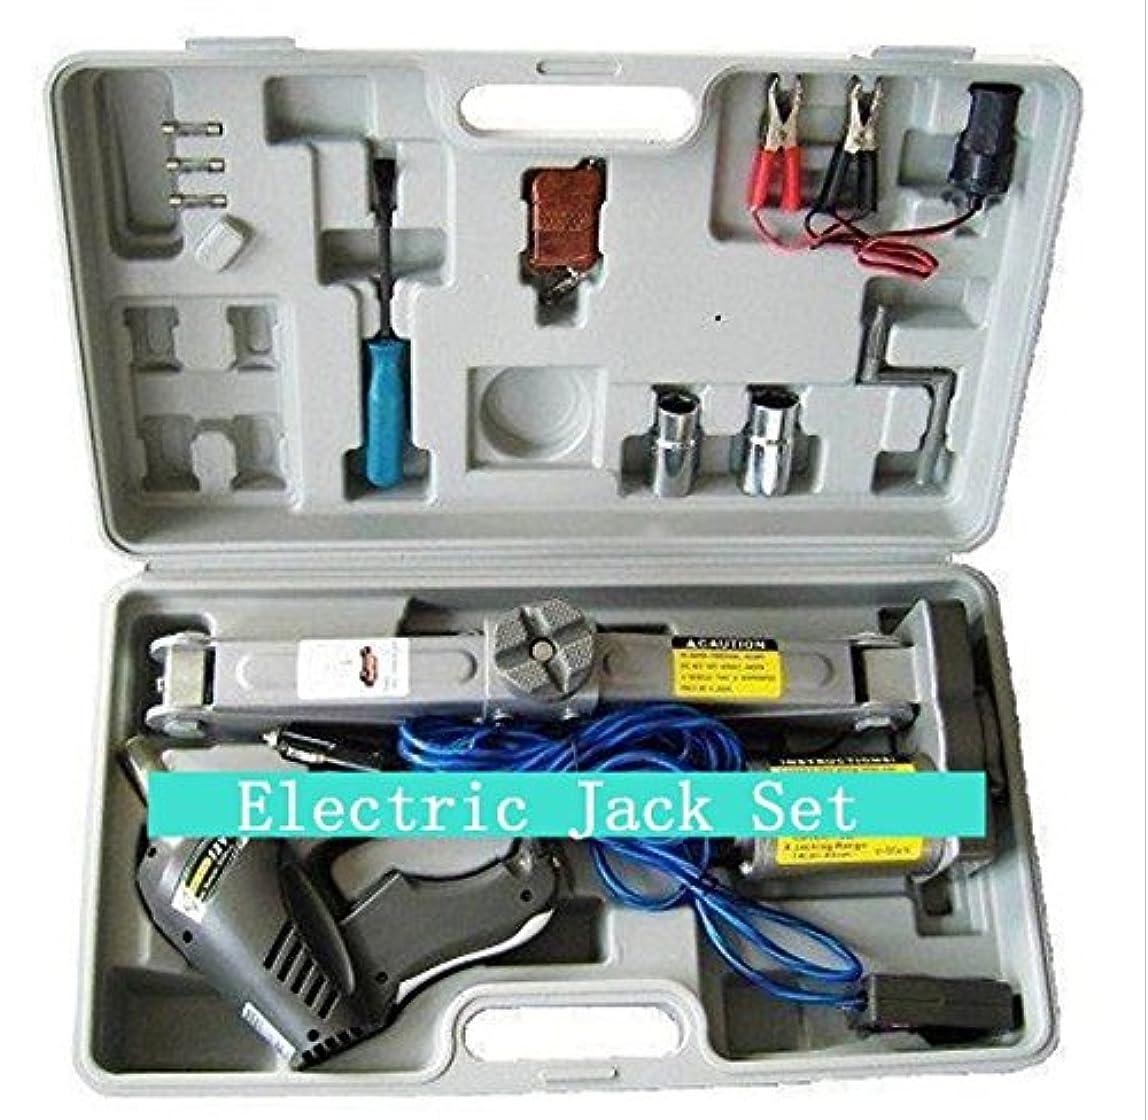 GOWE Electric Jack Set/12V Car Jack Set/High Travel Remove Control Jack xgziyzq050332